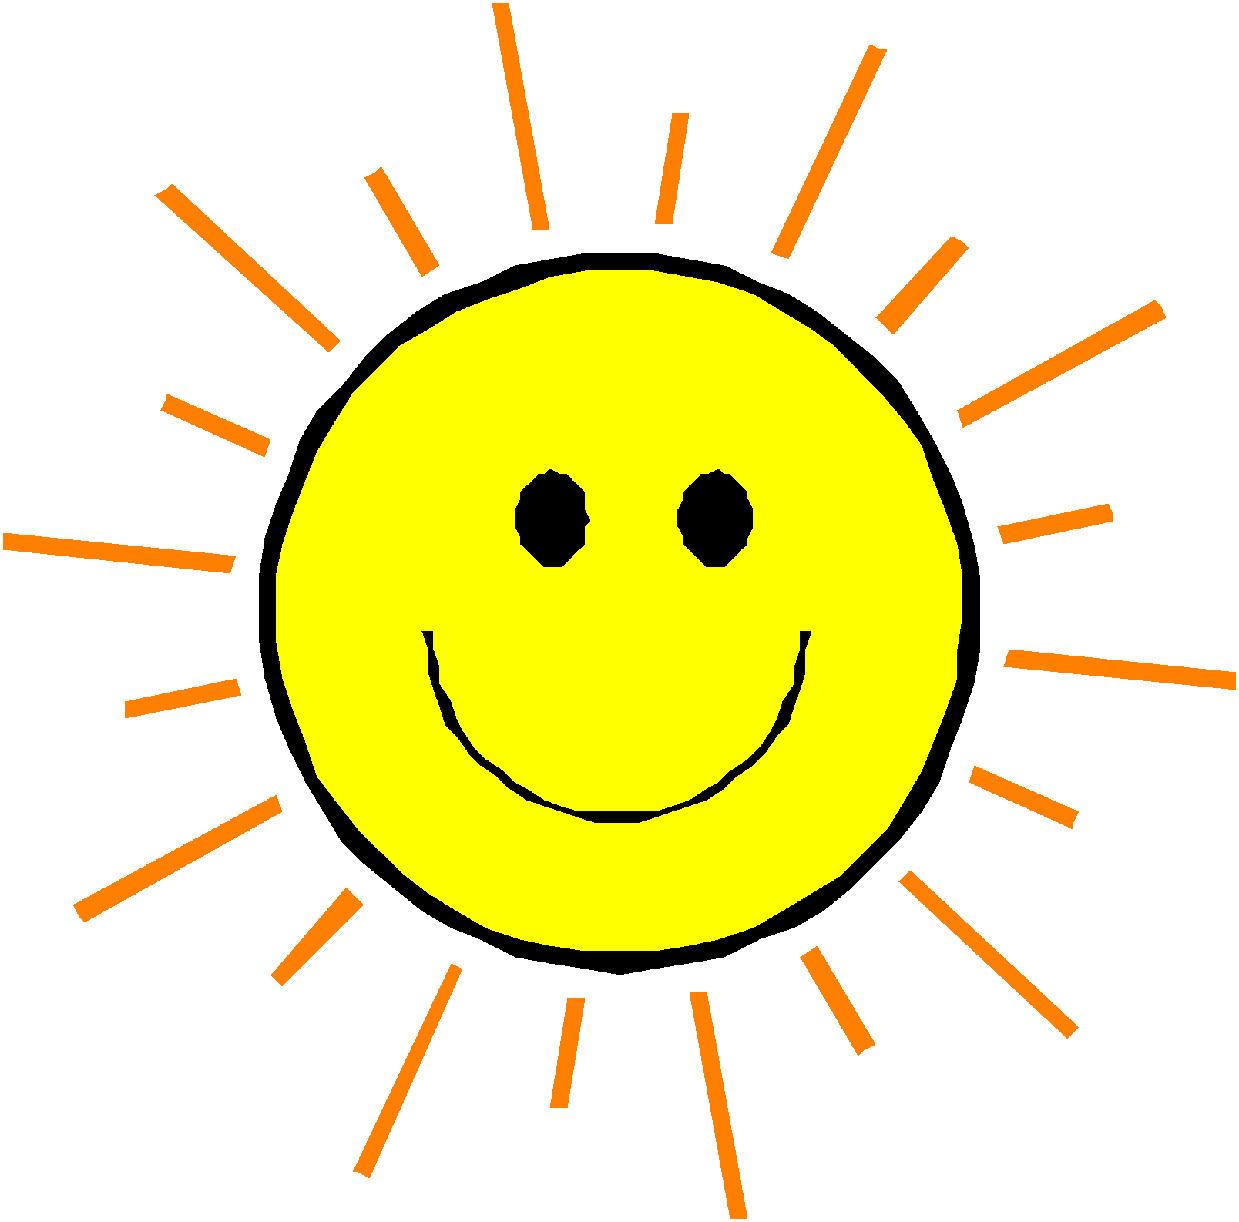 Sunshine free sun clipart public domain sun clip art images and 4 6.